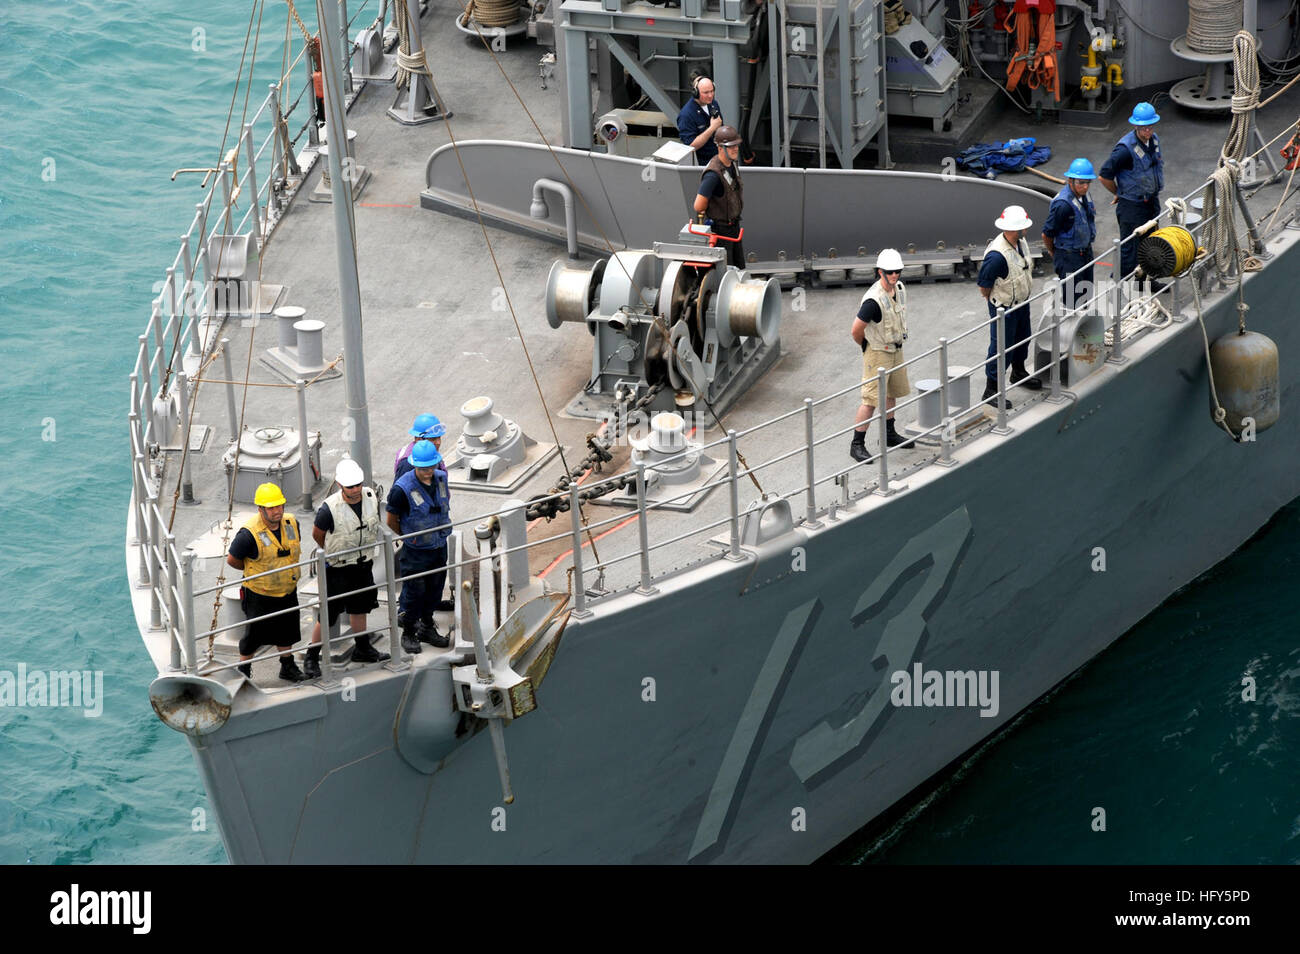 100423-N-0553R-066 ARABIAN GULF (April 23, 2010) The Avenger-class mine countermeasures ship USS Dextrous (MCM 13) - Stock Image